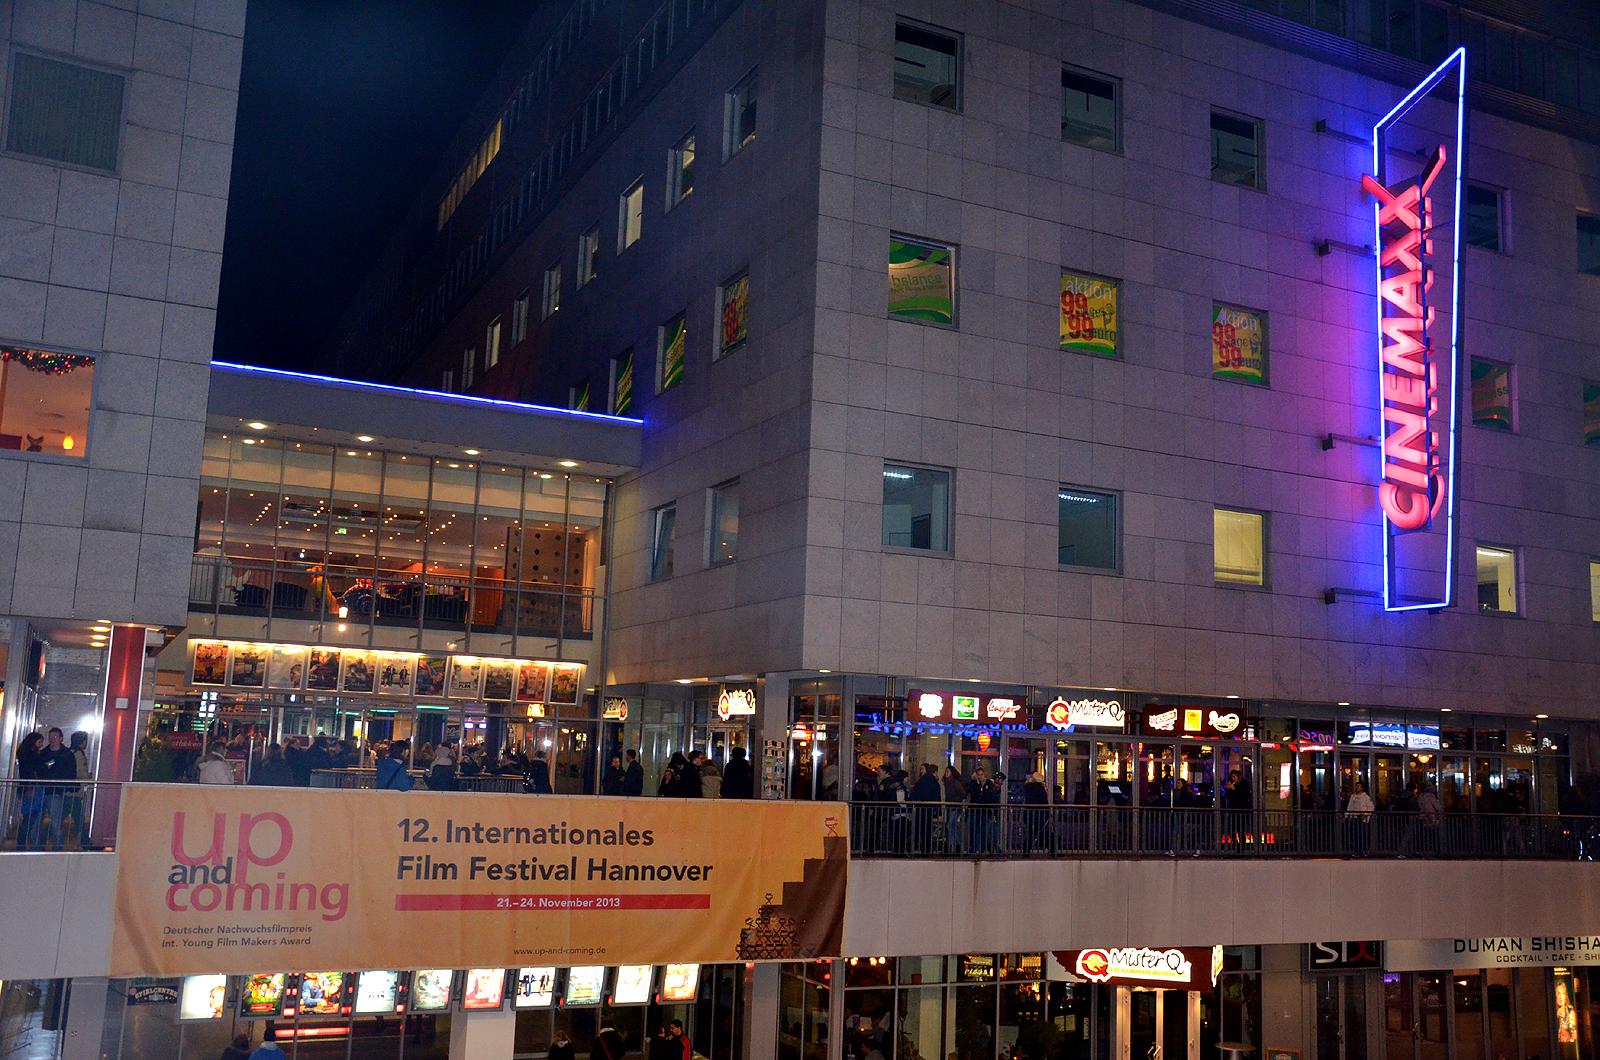 Cinemaxx Hannover Programm